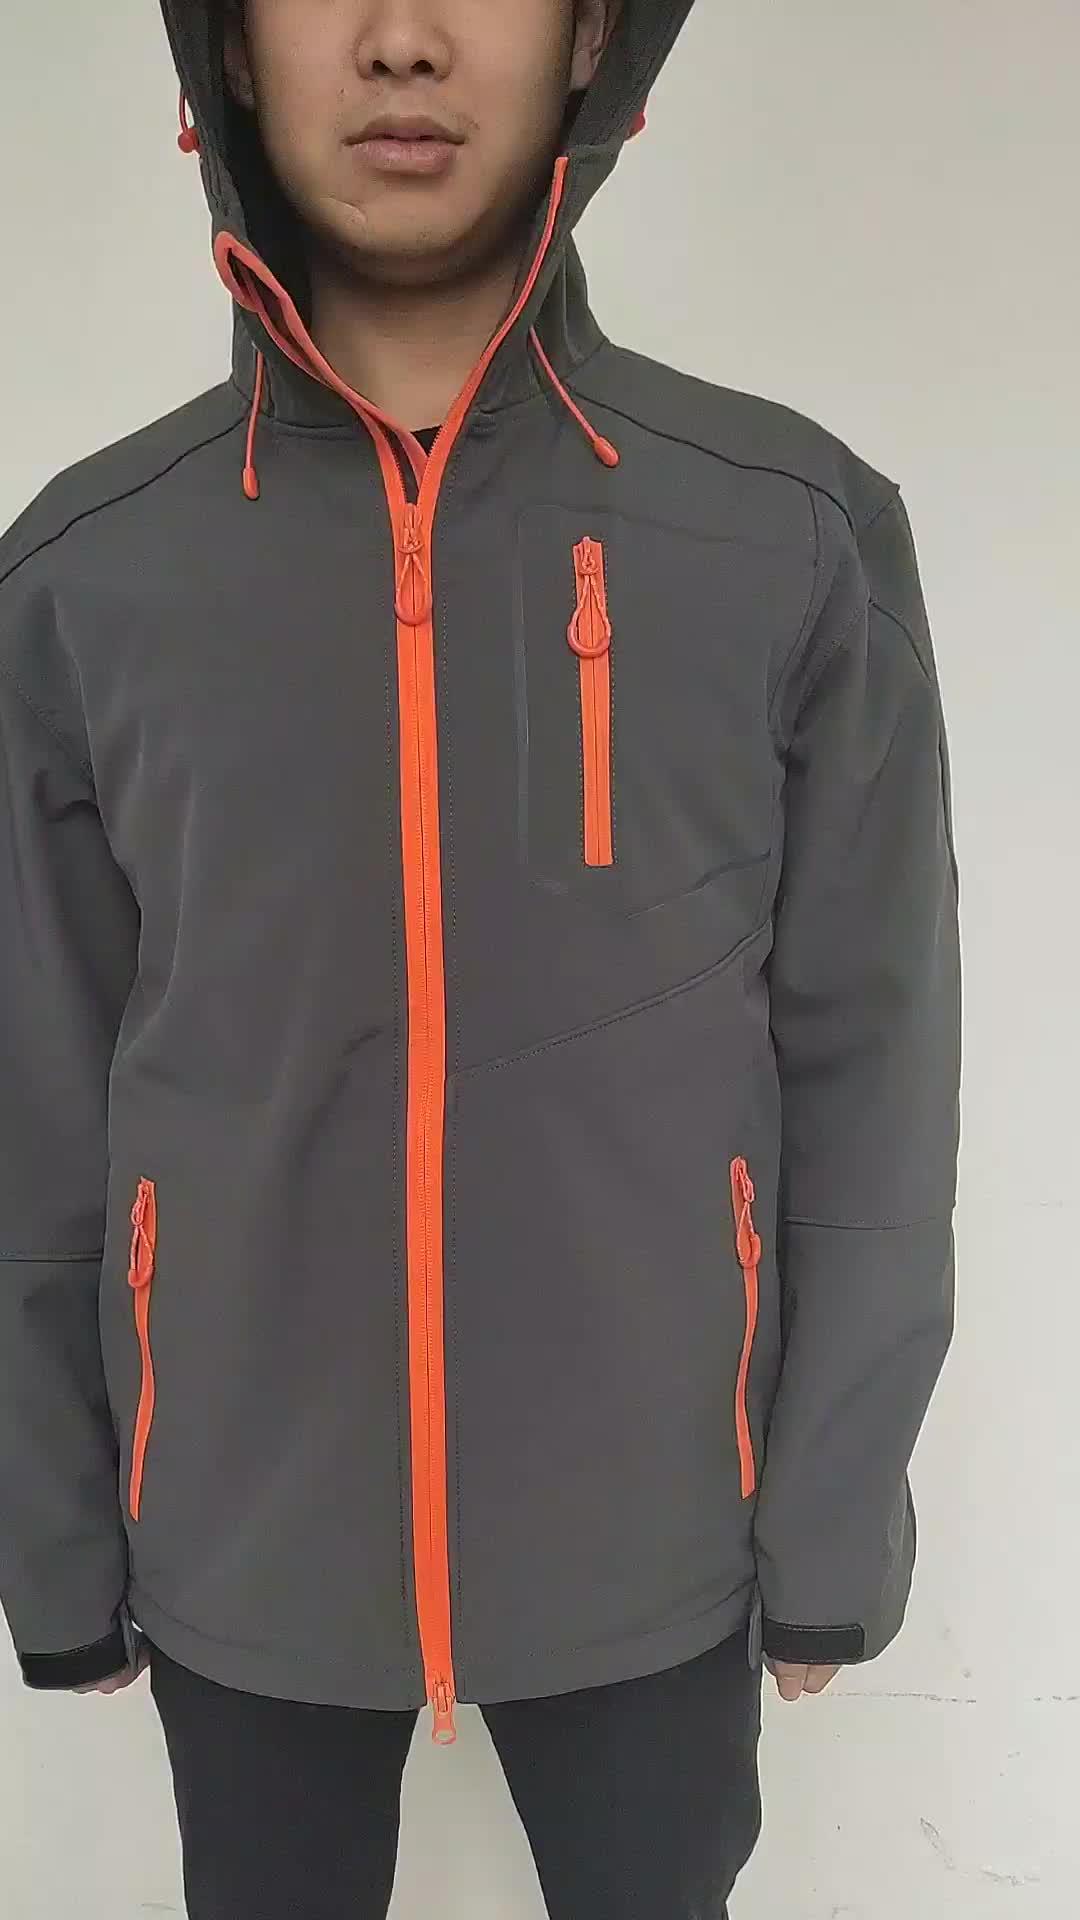 Custom Men กีฬา Softshell แจ็คเก็ตสีเทากลางแจ้ง Camping Coats ความร้อนกันน้ำ Soft Shell เสื้อแจ็คเก็ต Hood